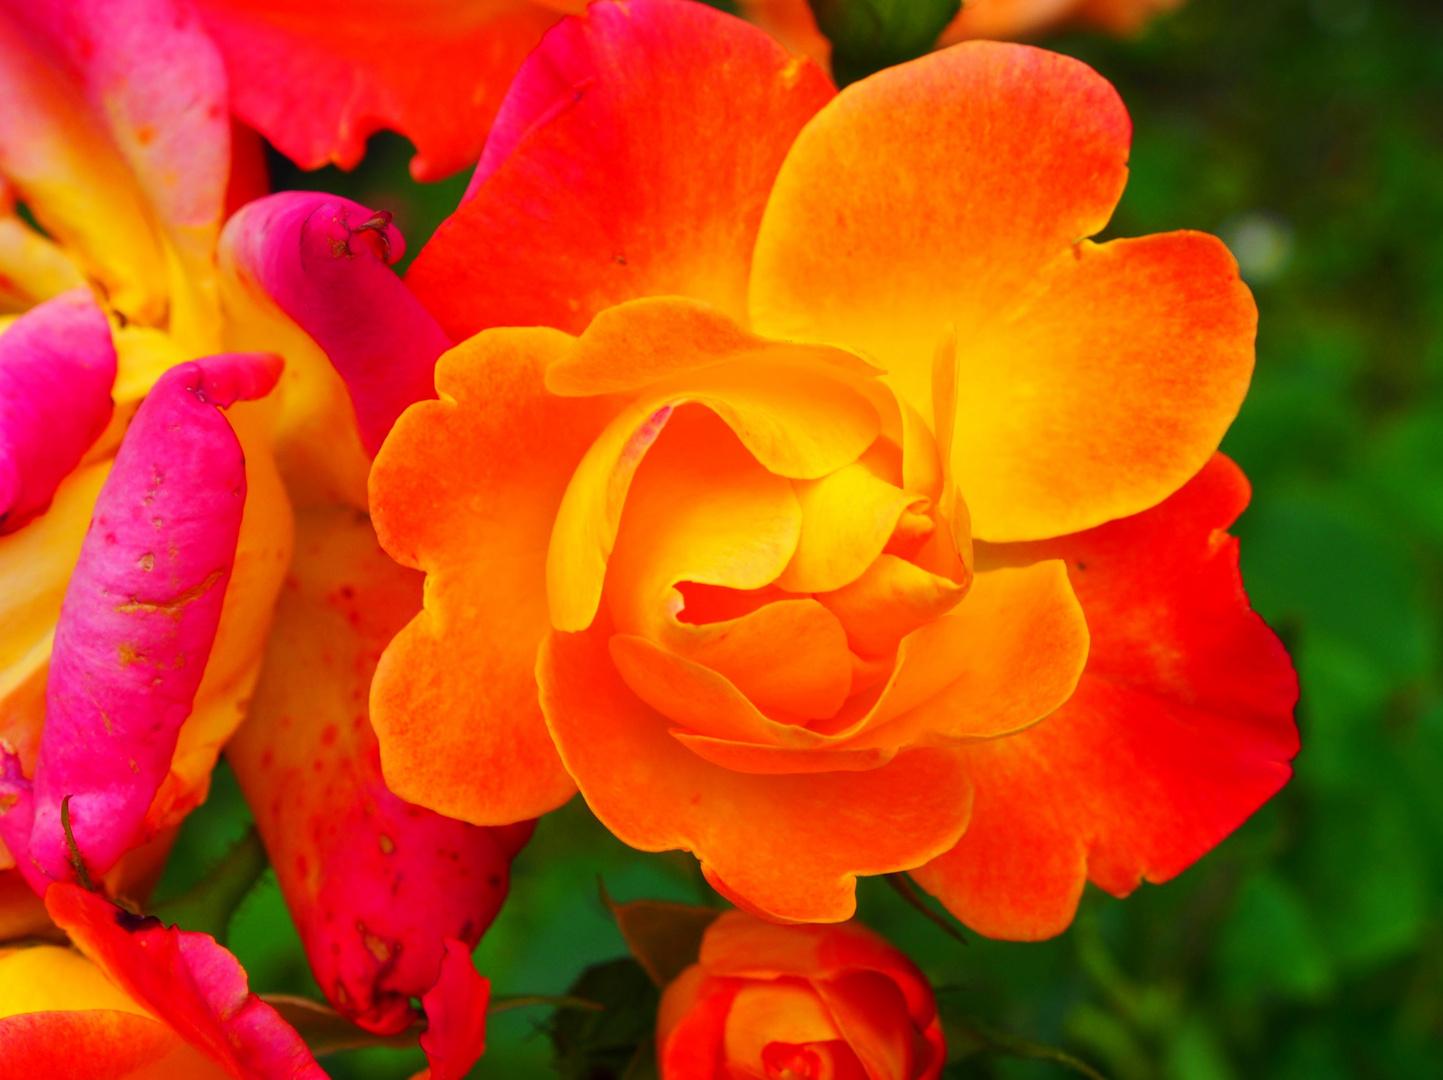 Rose - Pop Art